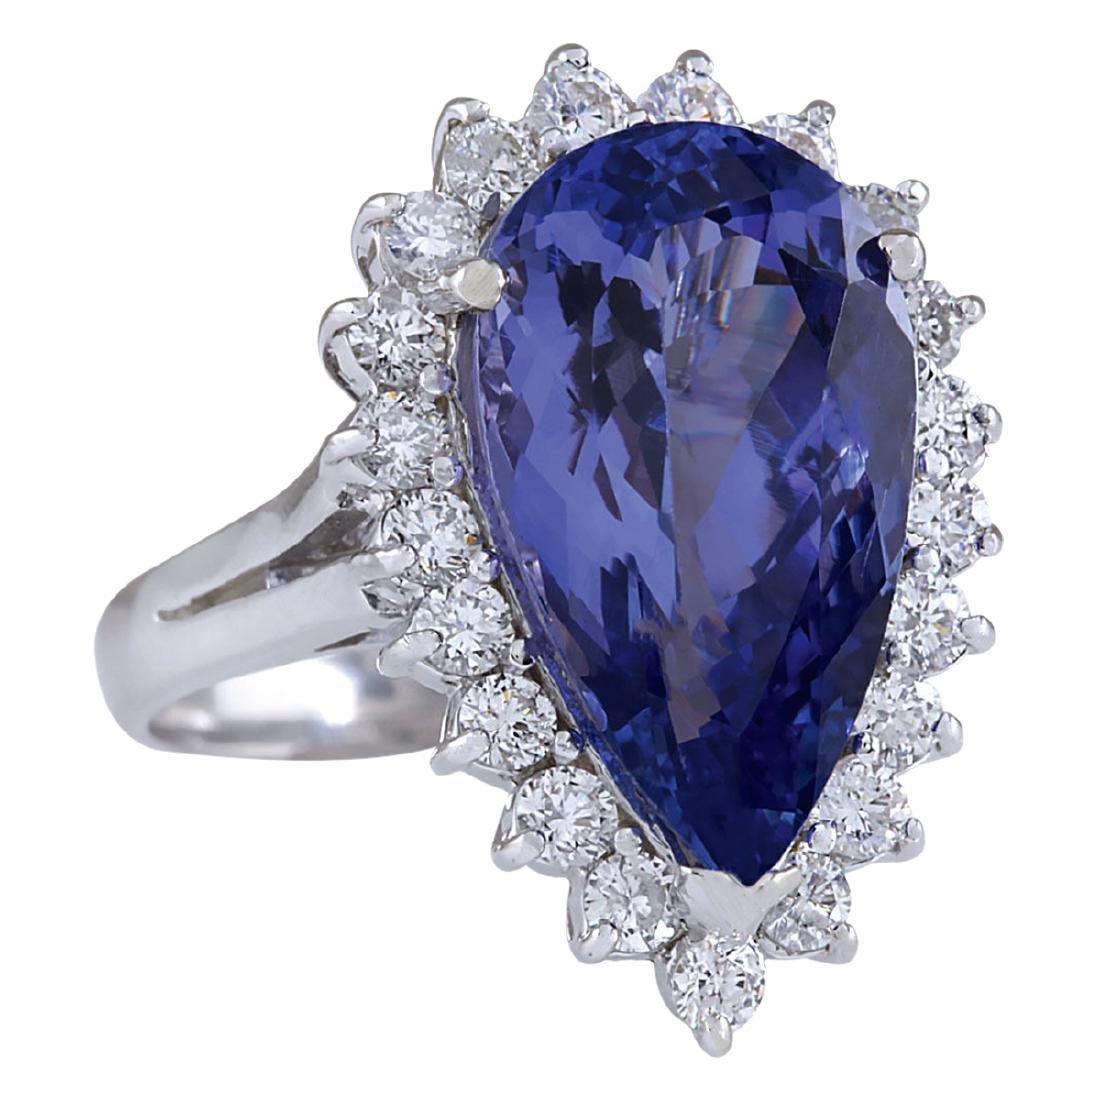 7.26CTW Natural Tanzanite And Diamond Ring In 18K White - 2